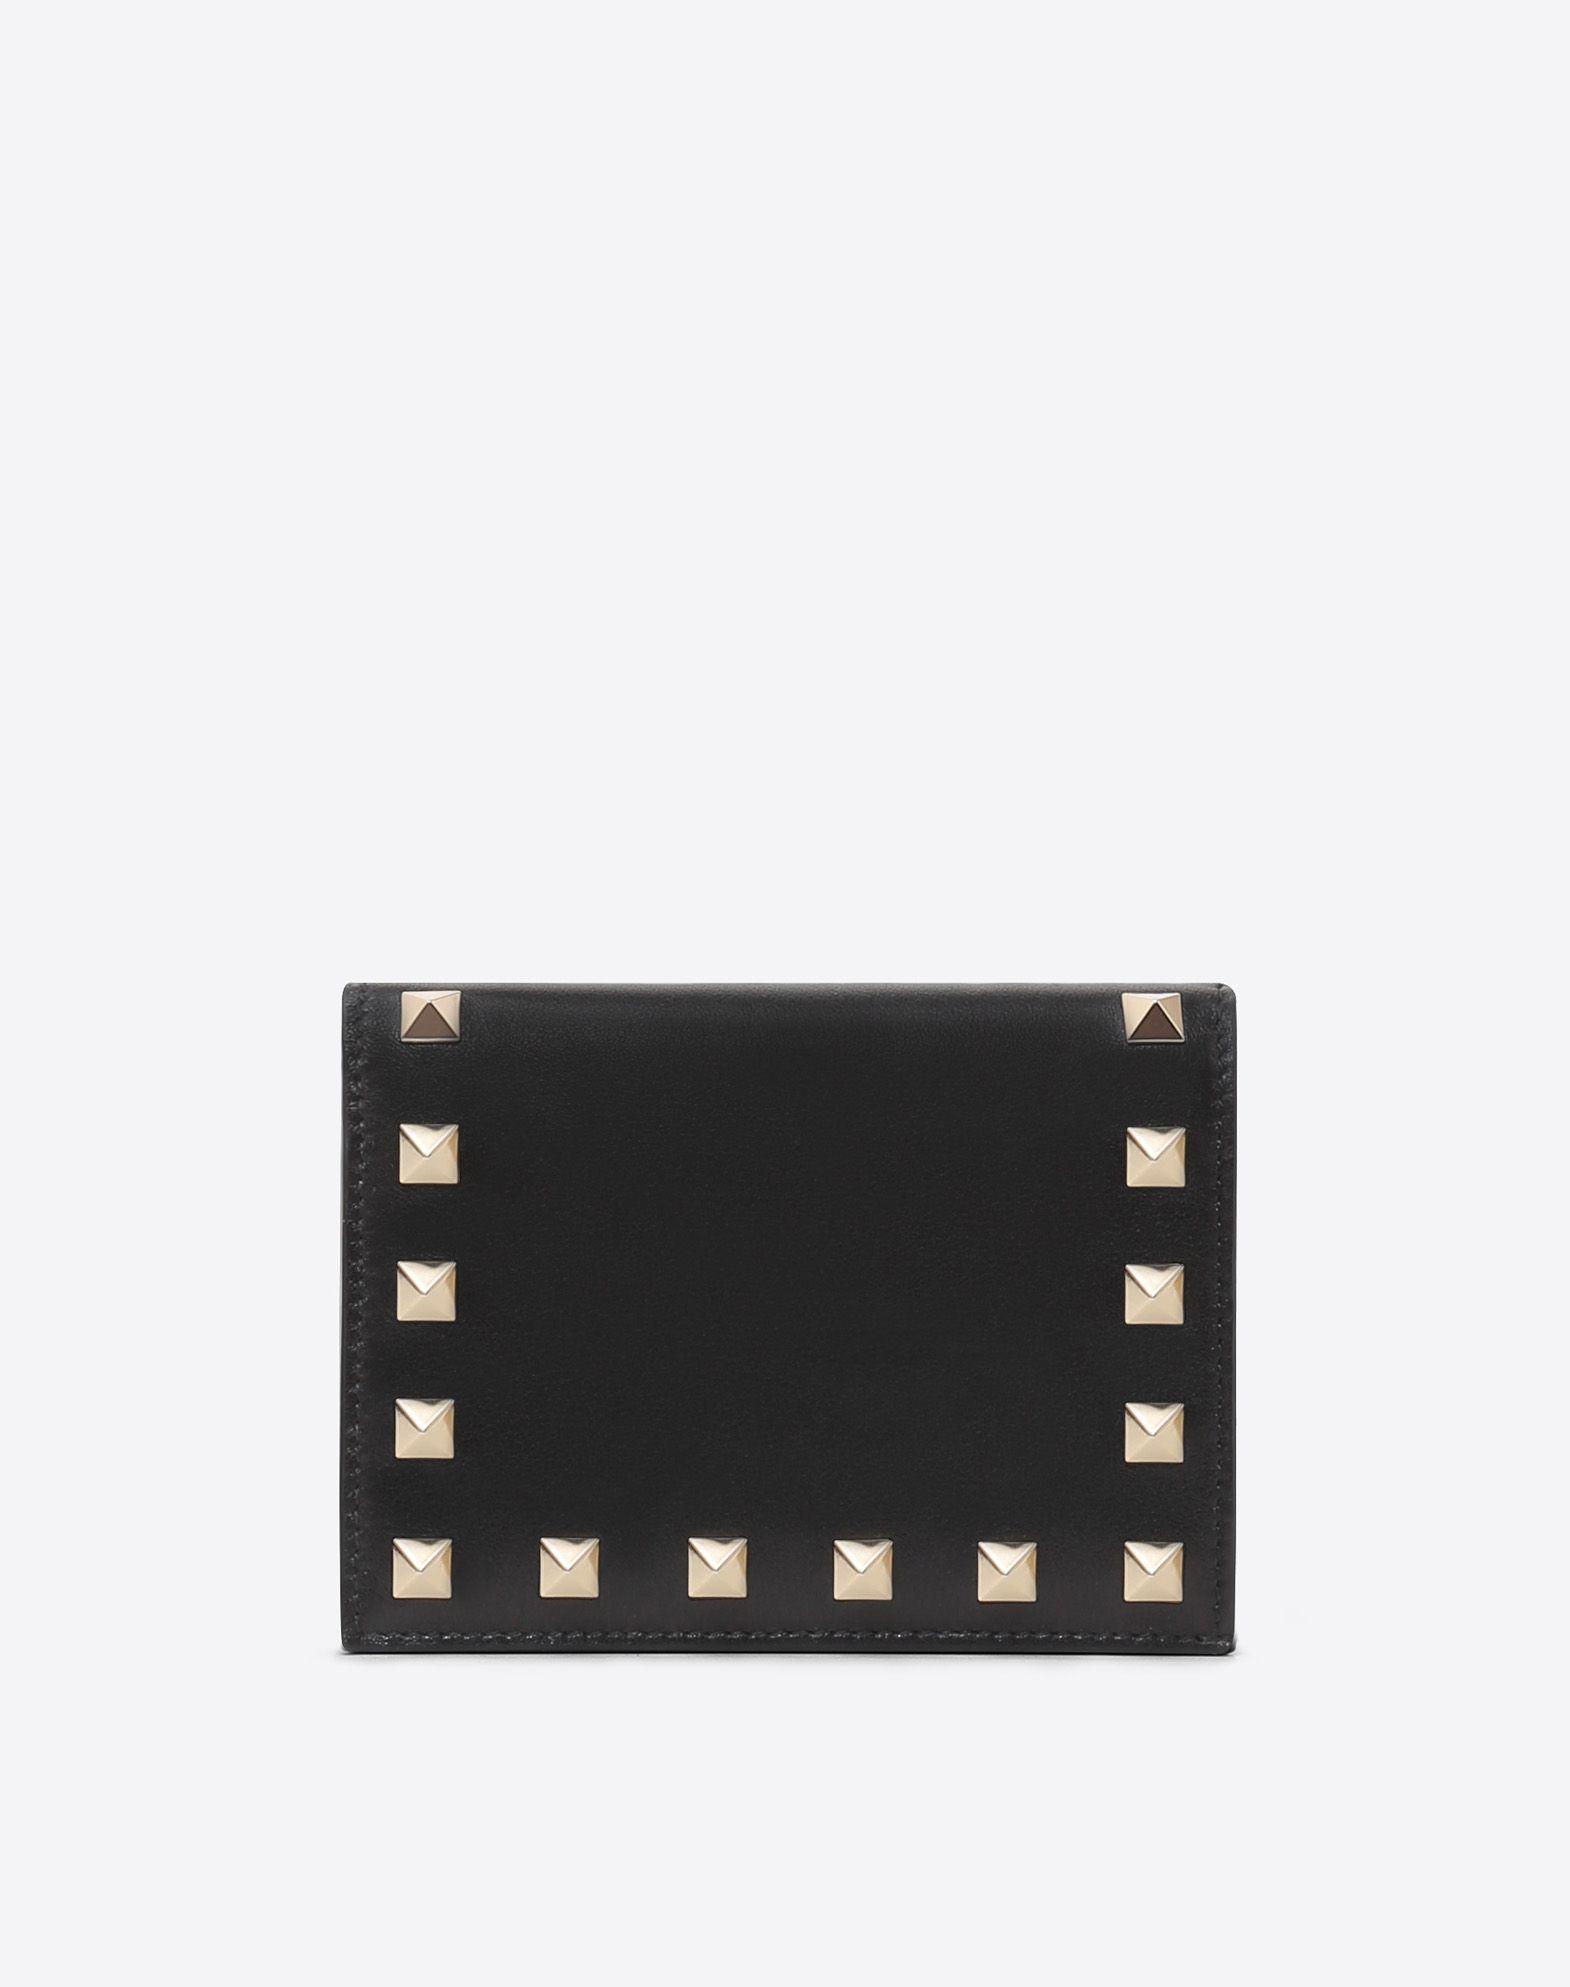 VALENTINO GARAVANI Rockstud Compact Wallet COMPACT WALLETS E f